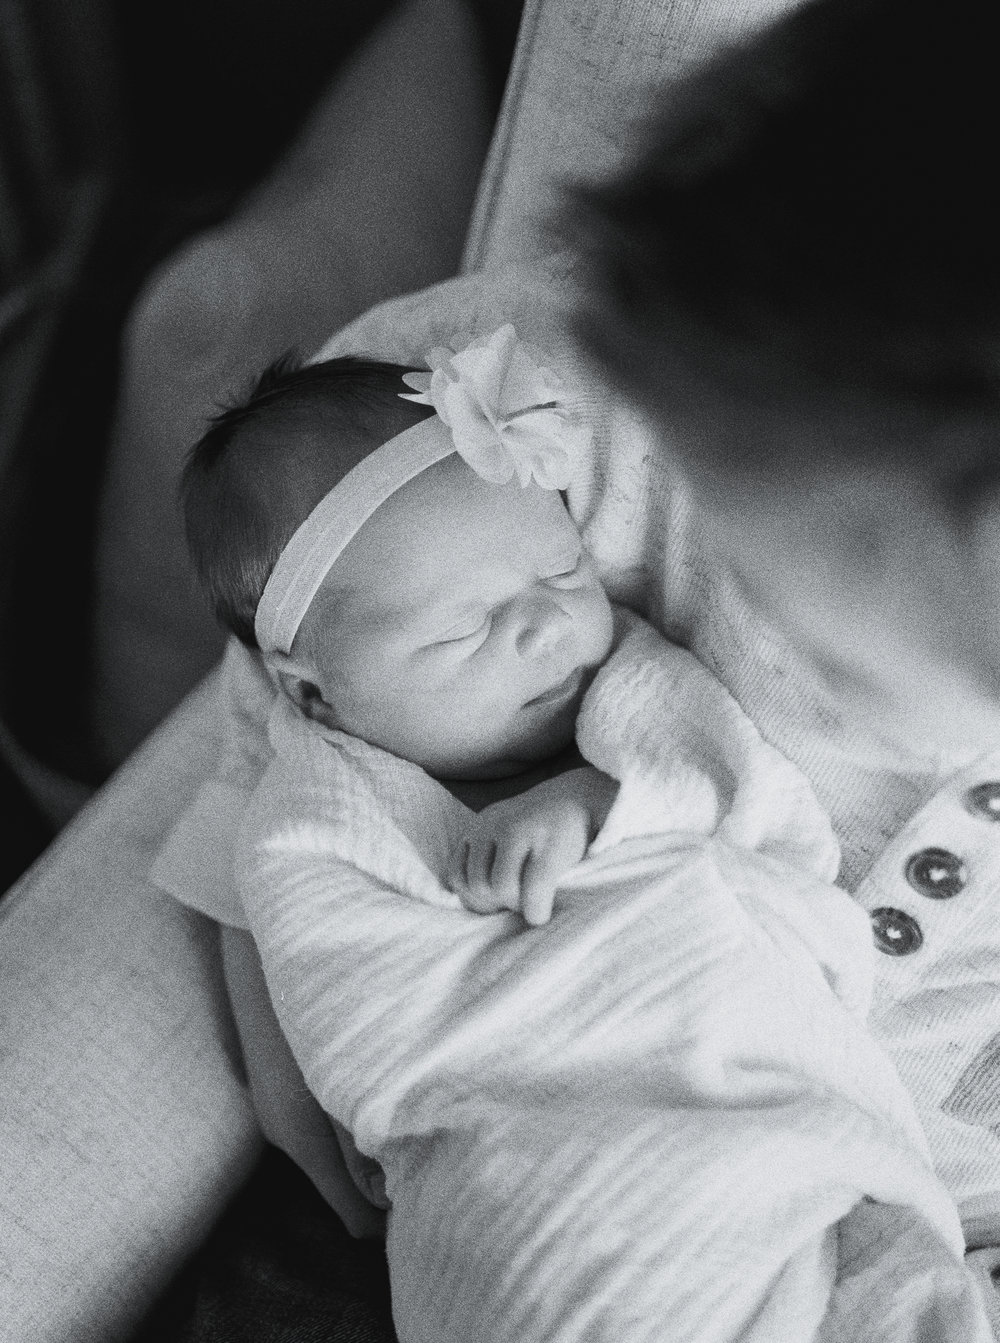 Milner Georgia In-Home Film Newborn Session 4